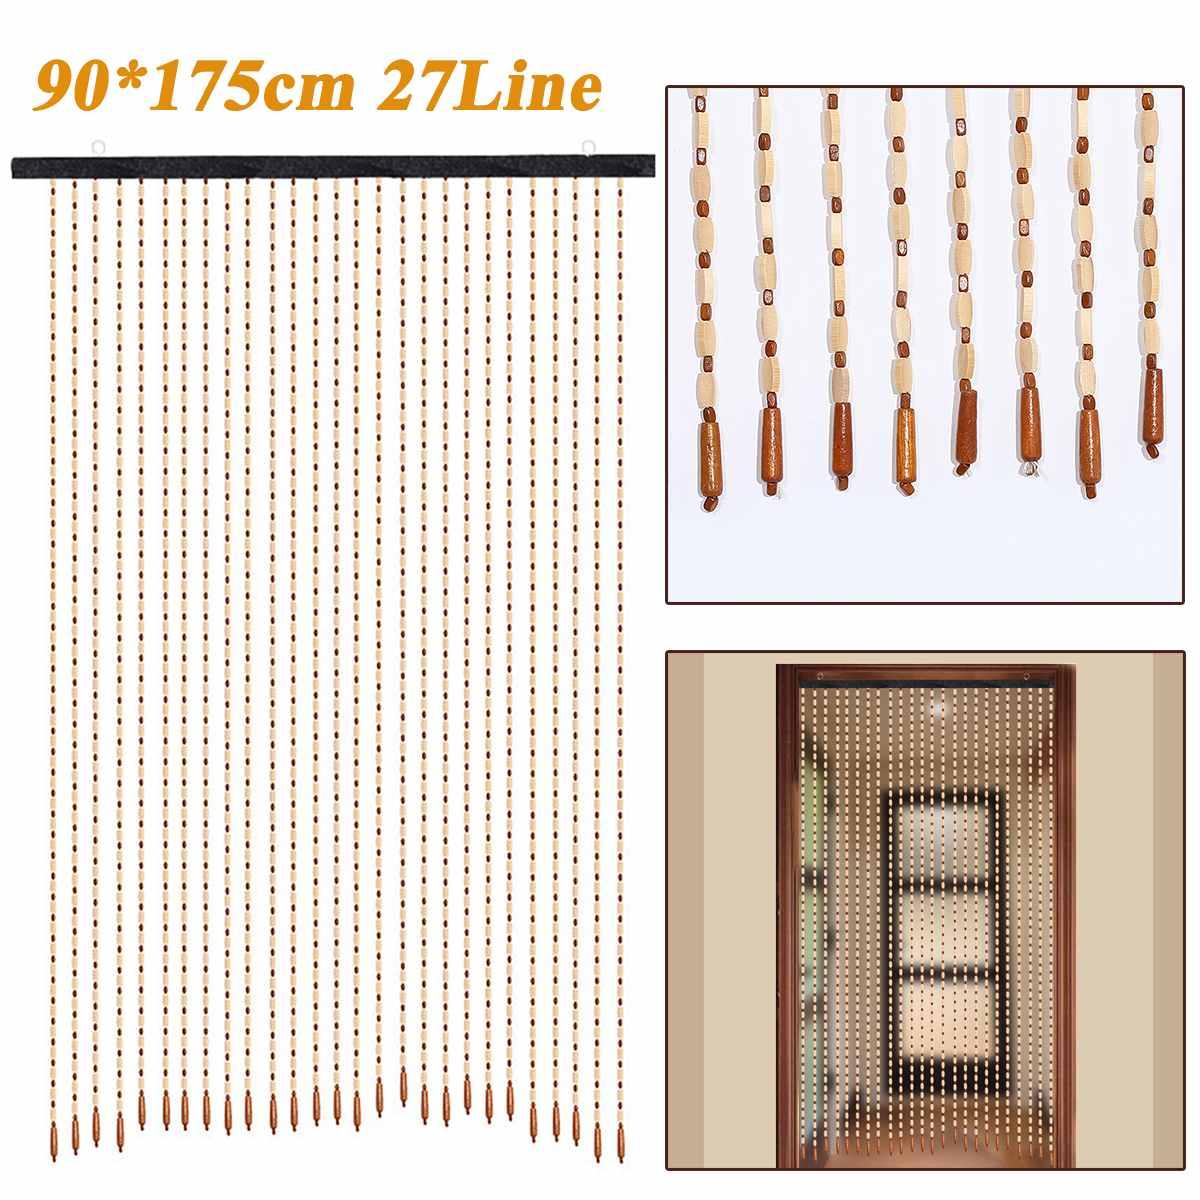 cortina fly tela artesanal feijão string blinds